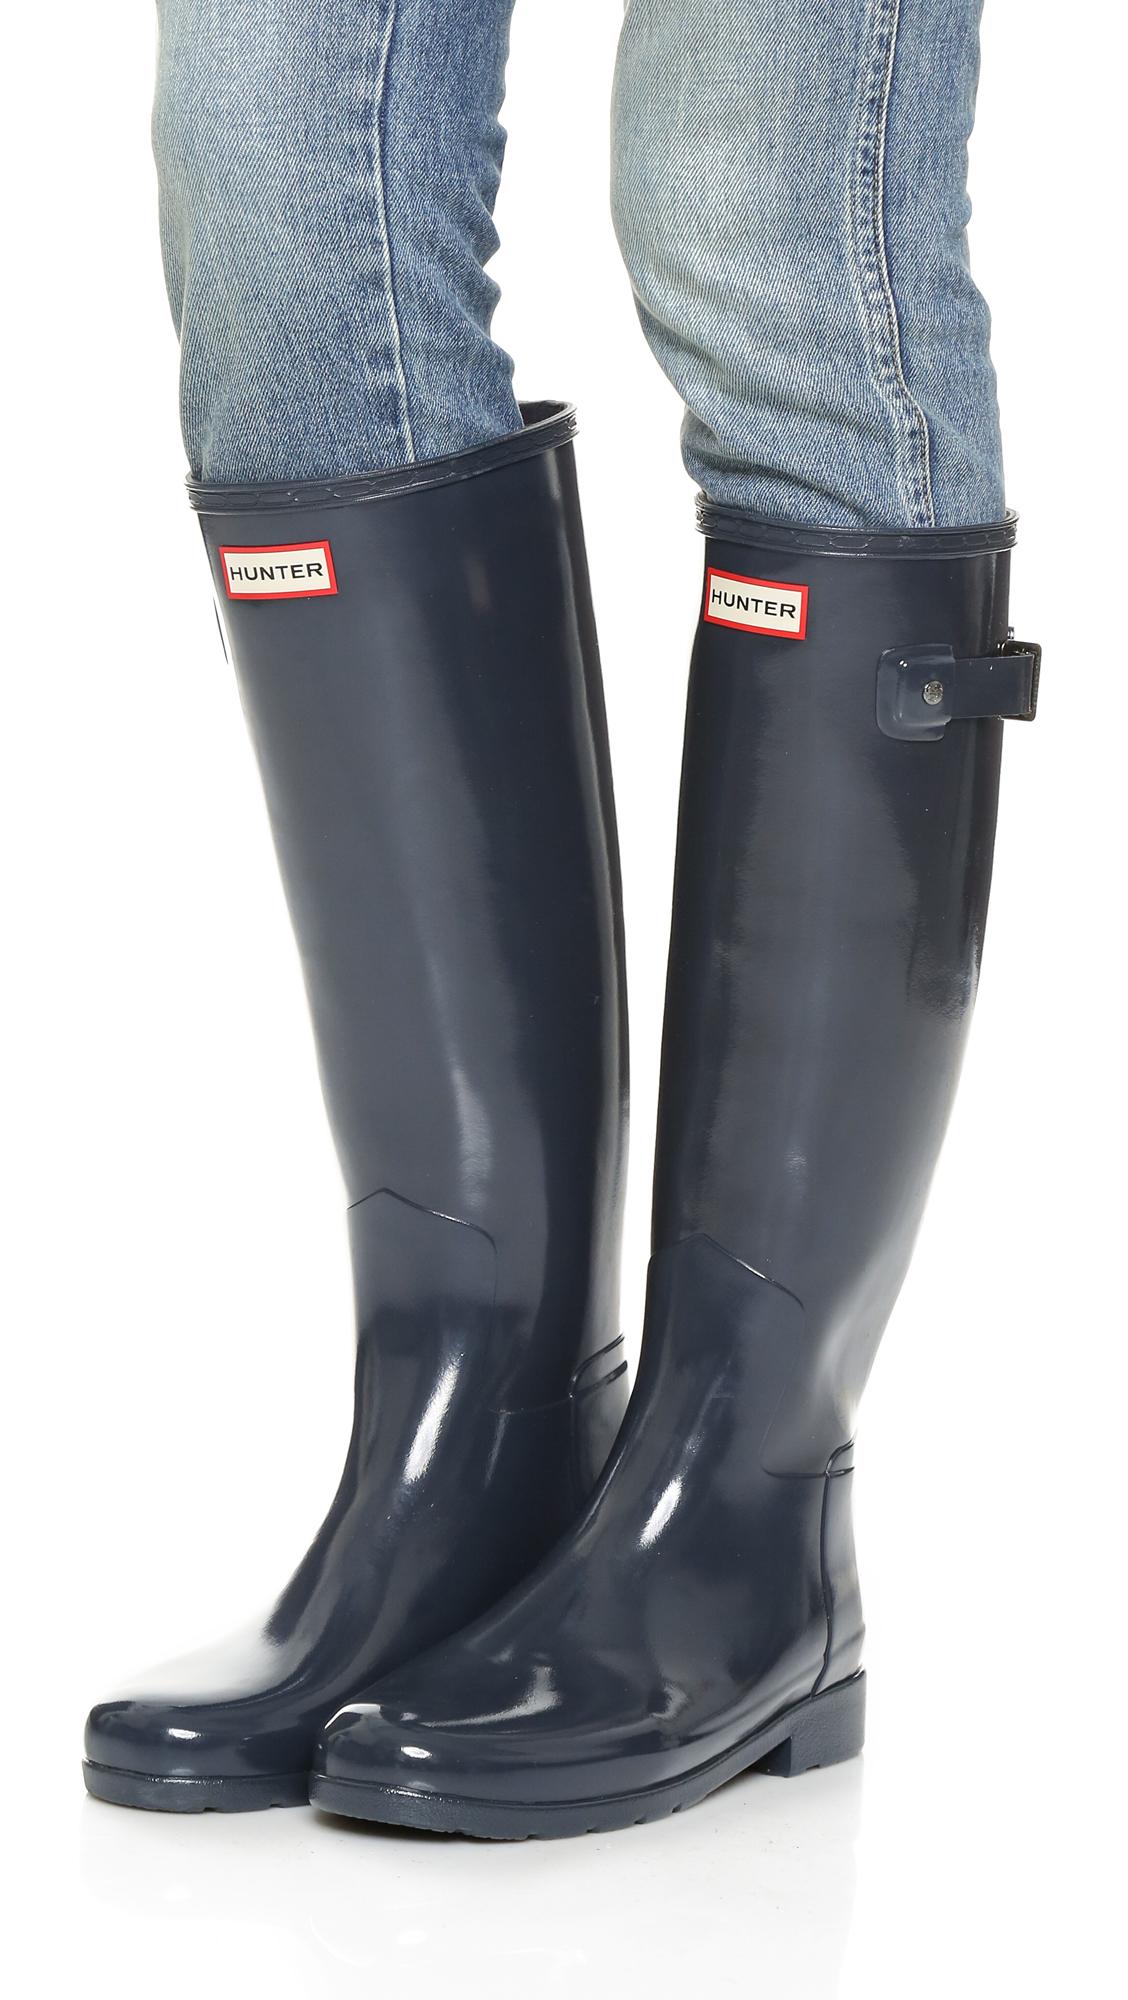 c7052a4a22a55 Lyst - HUNTER Original Refined Gloss Boots in Blue